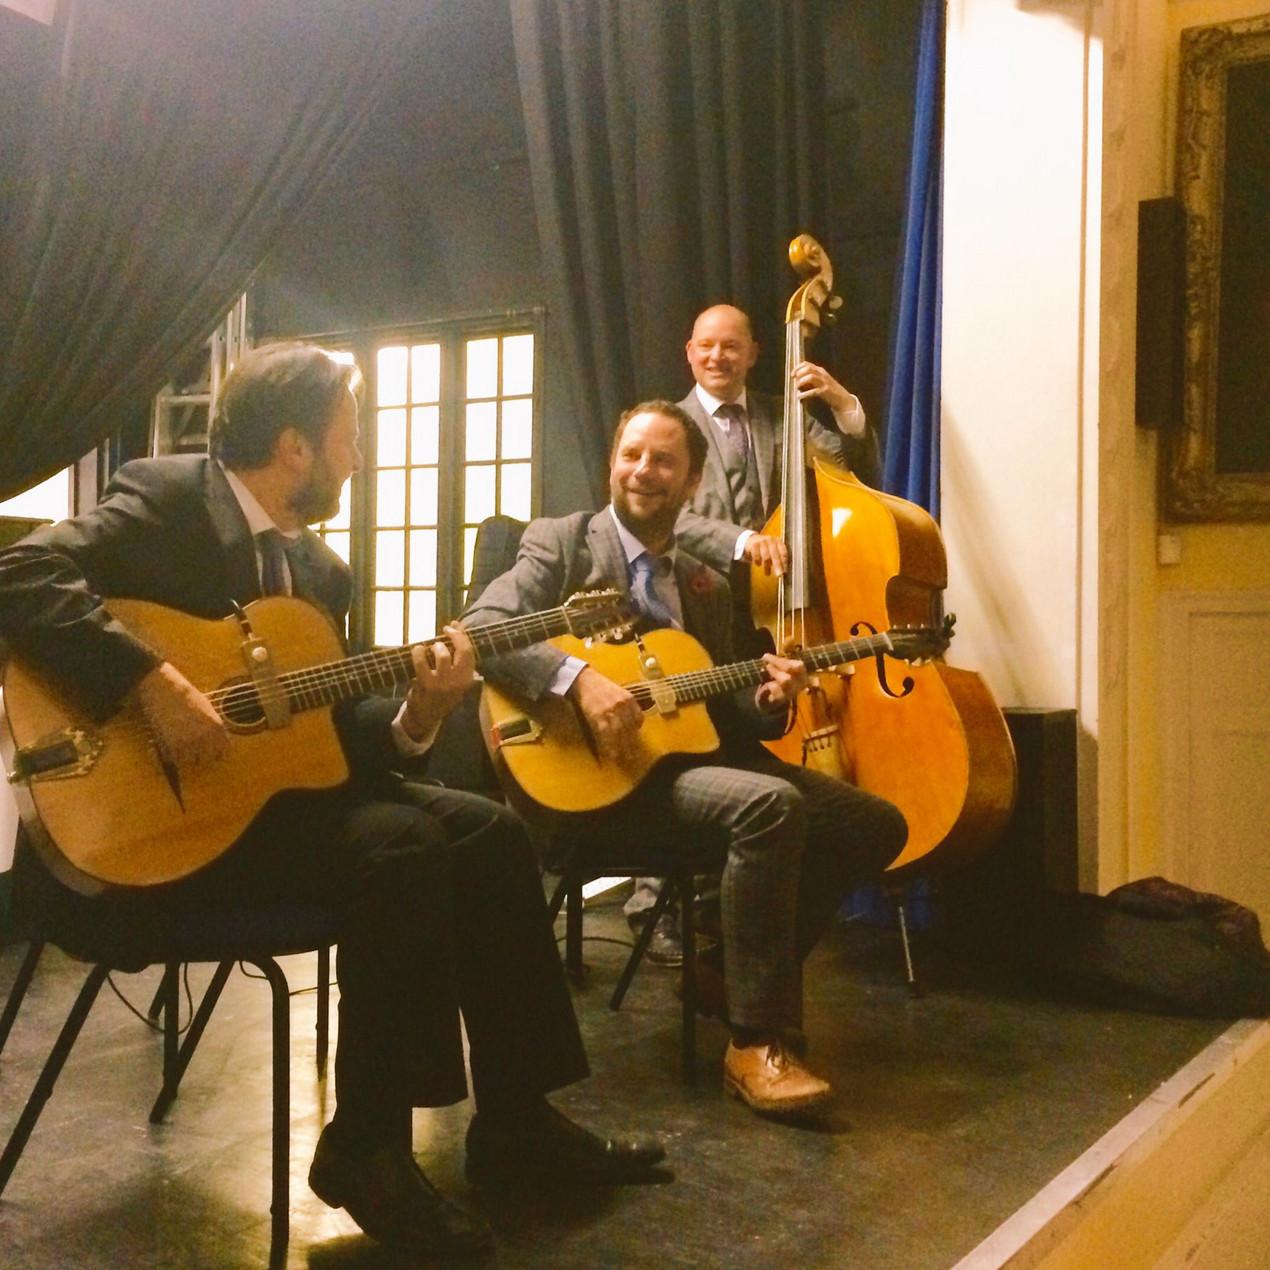 Jonny Hepbir Trio play a 50th Birthday Party at Tenterden Town Hall in Kent